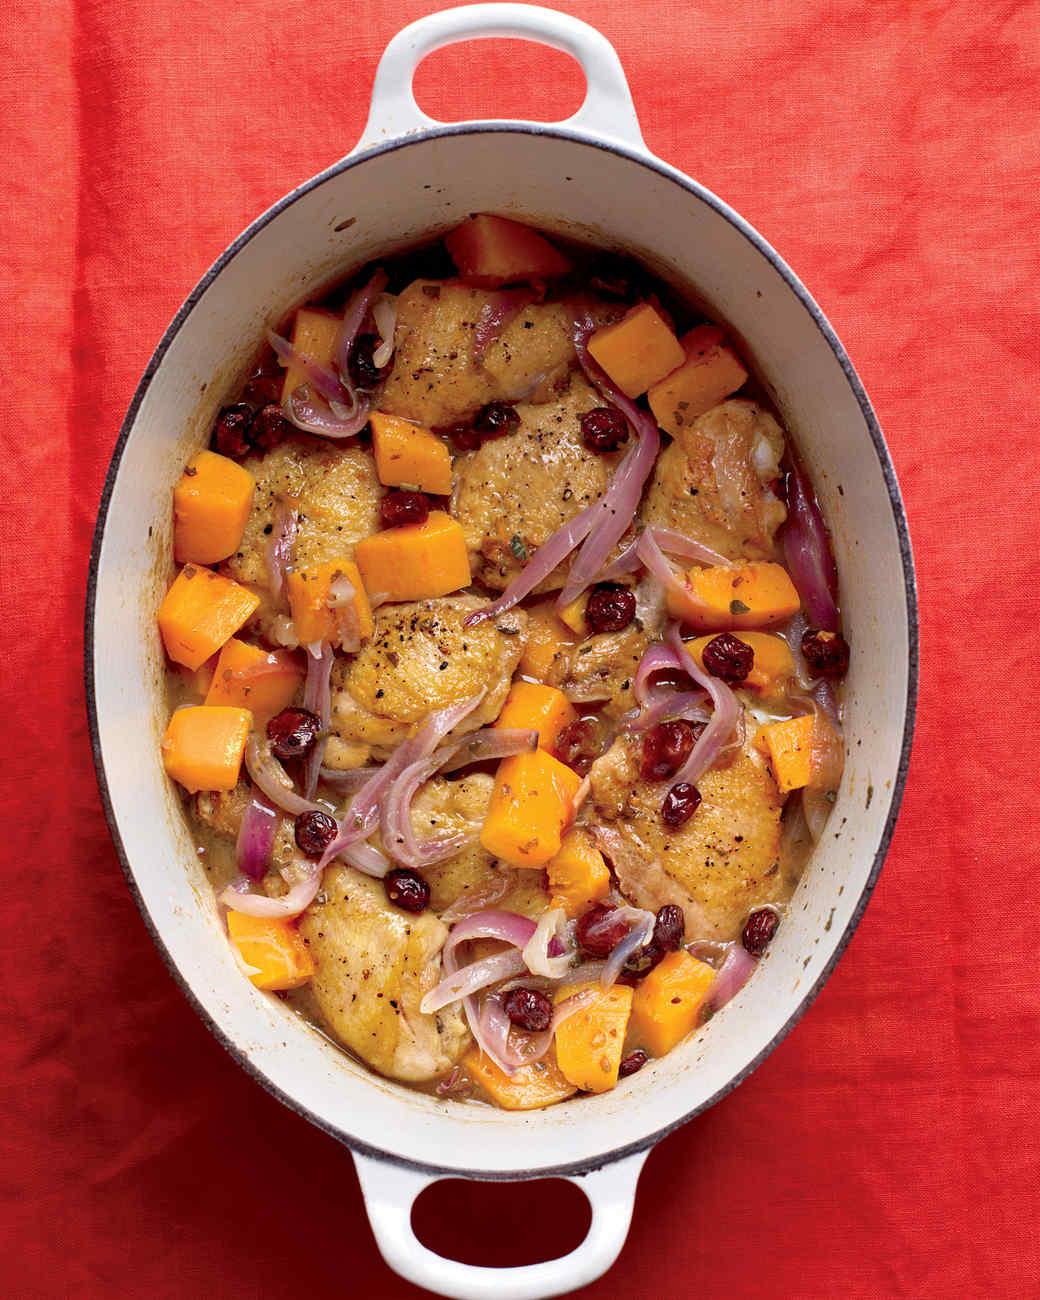 braised-chicken-butternut-squash-med107508.jpg